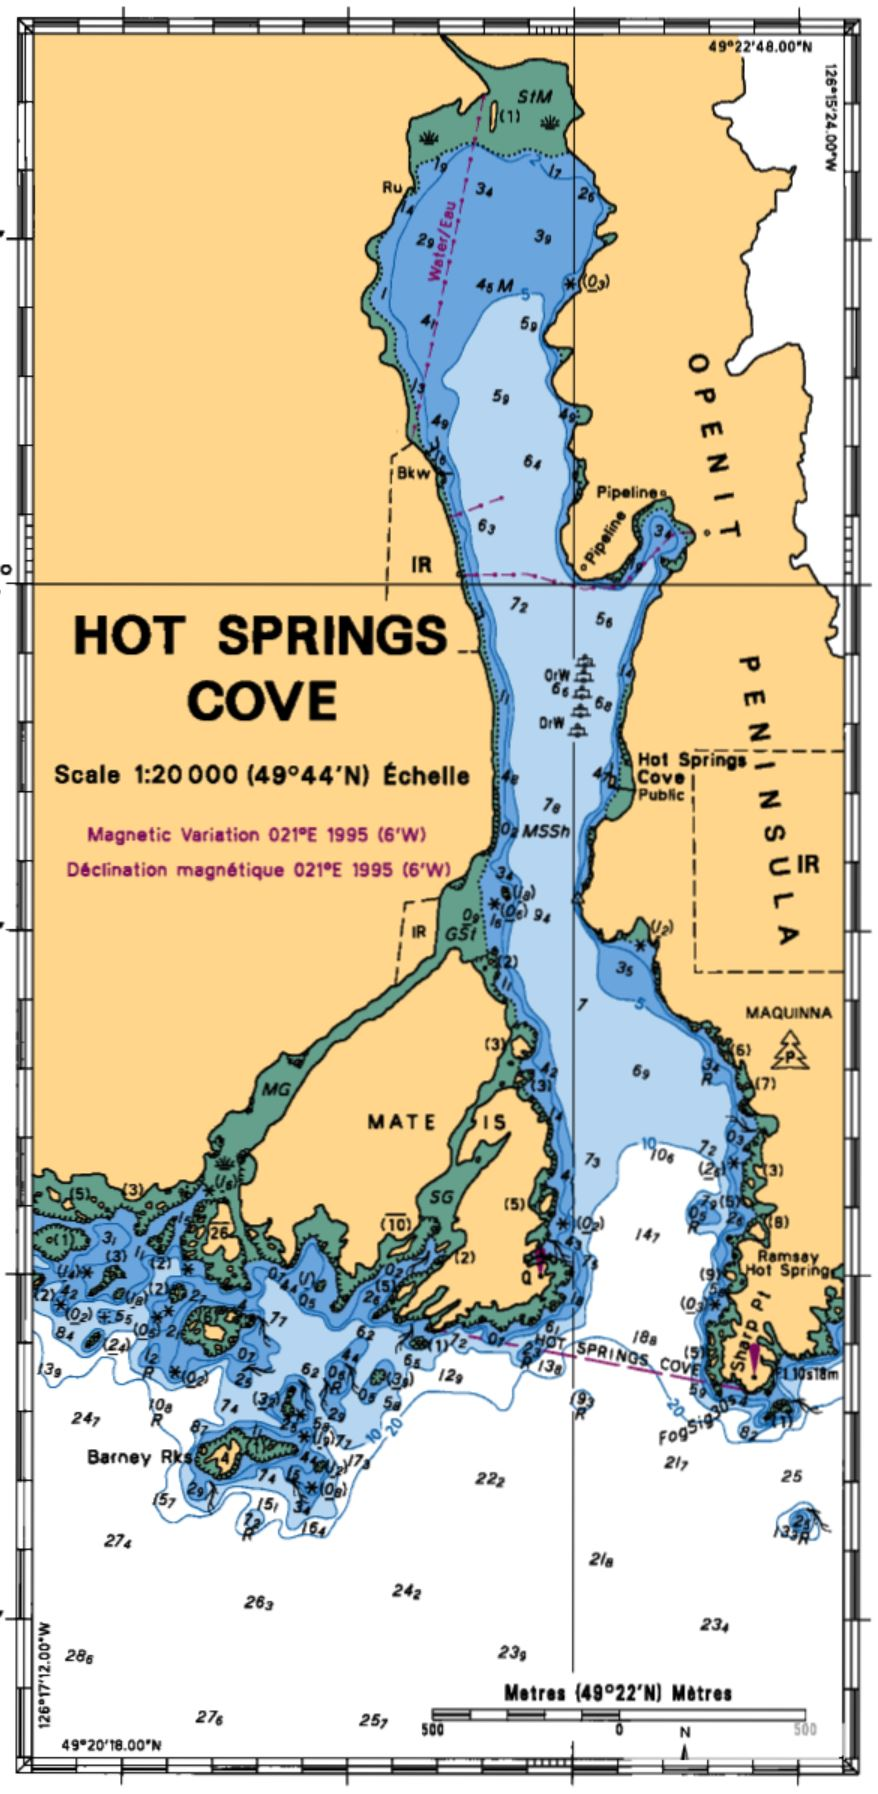 hotsprings